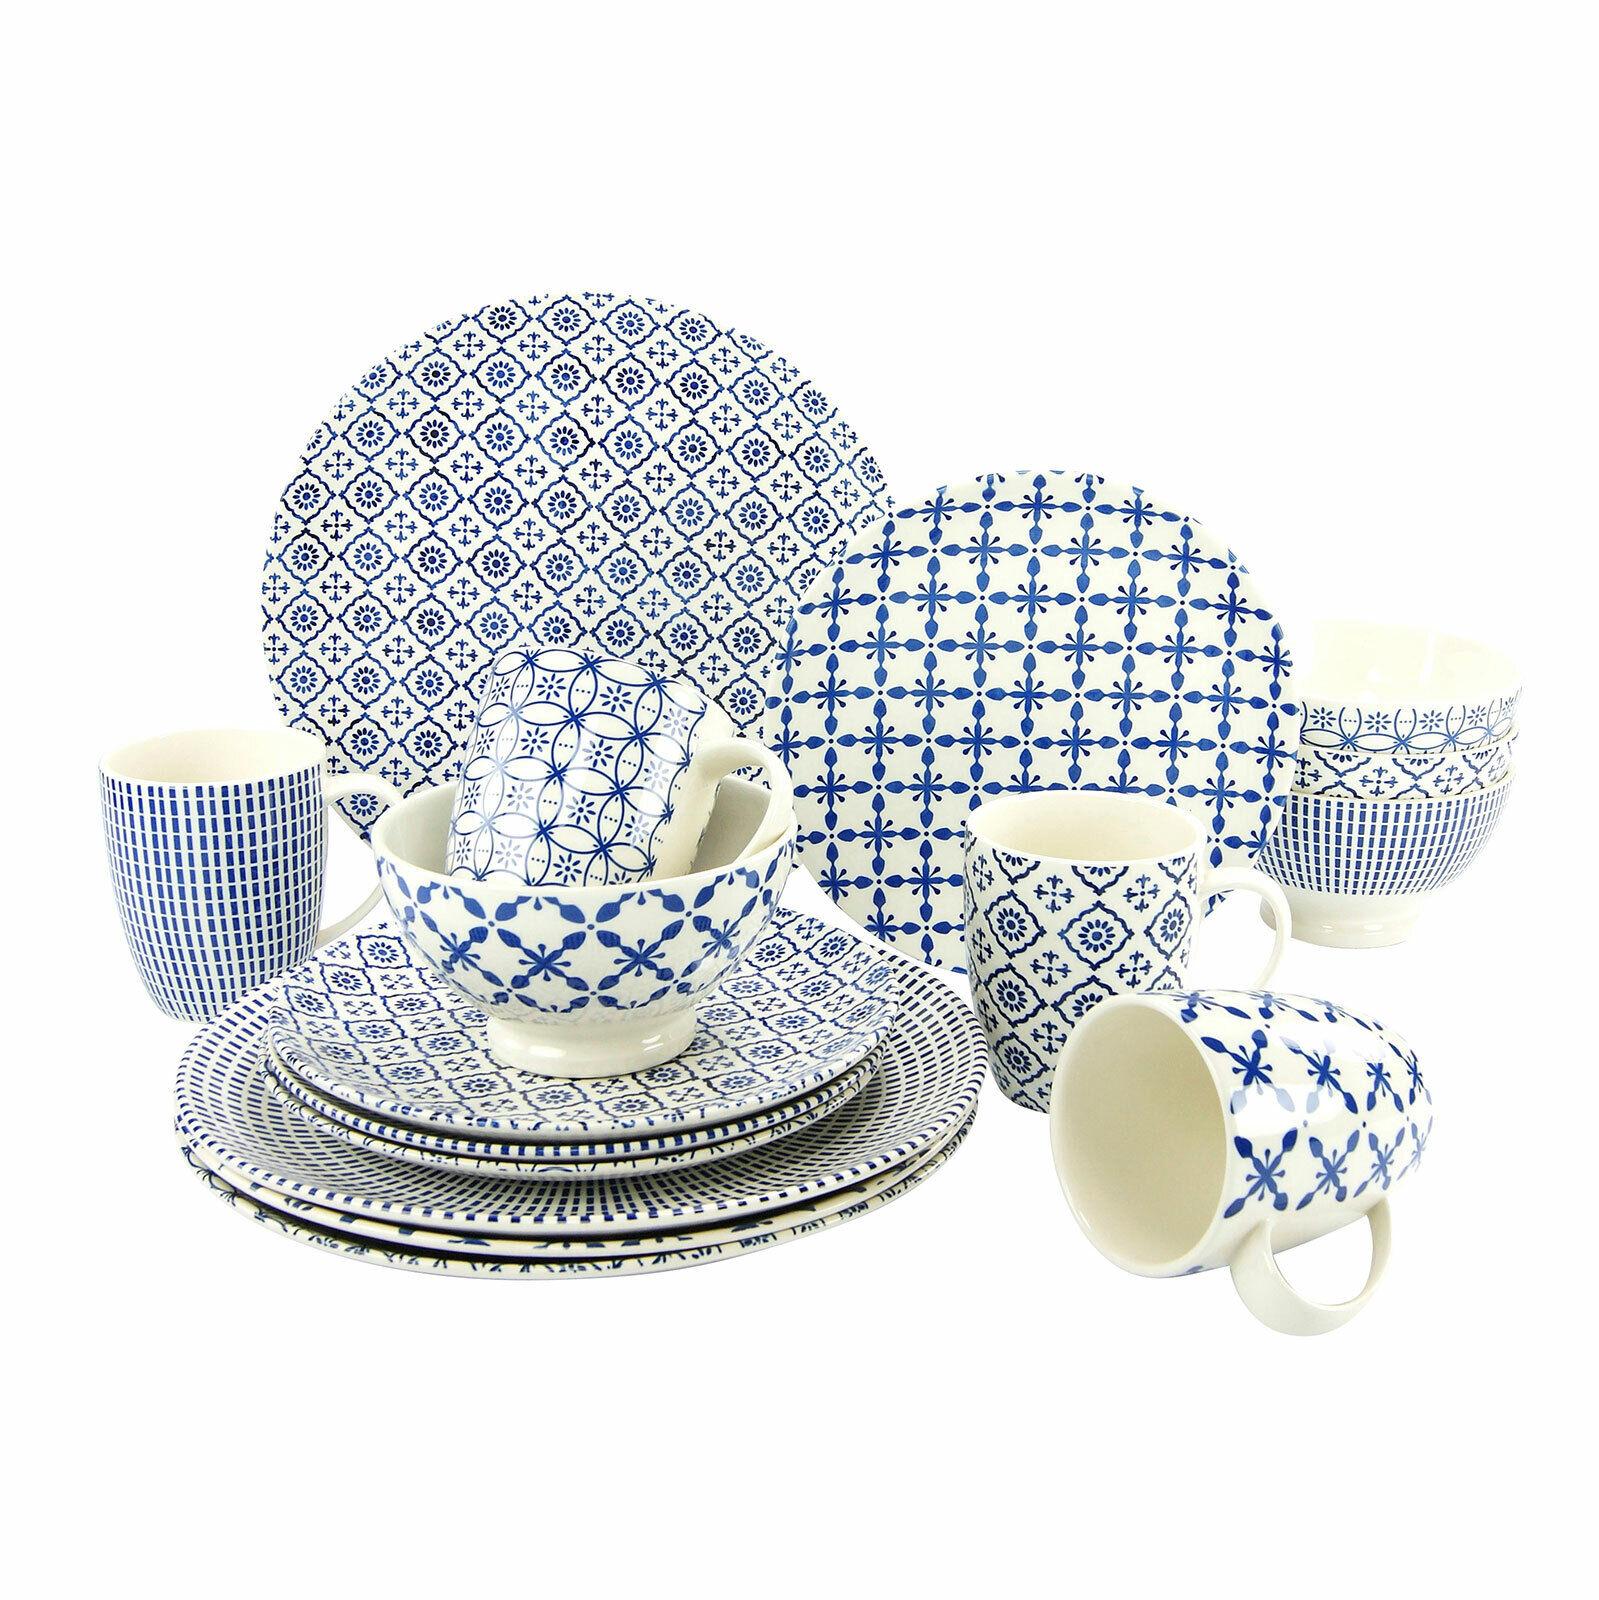 Creatable 19972 Levante Bleu Combi Service 16tlg vaisselle service de table